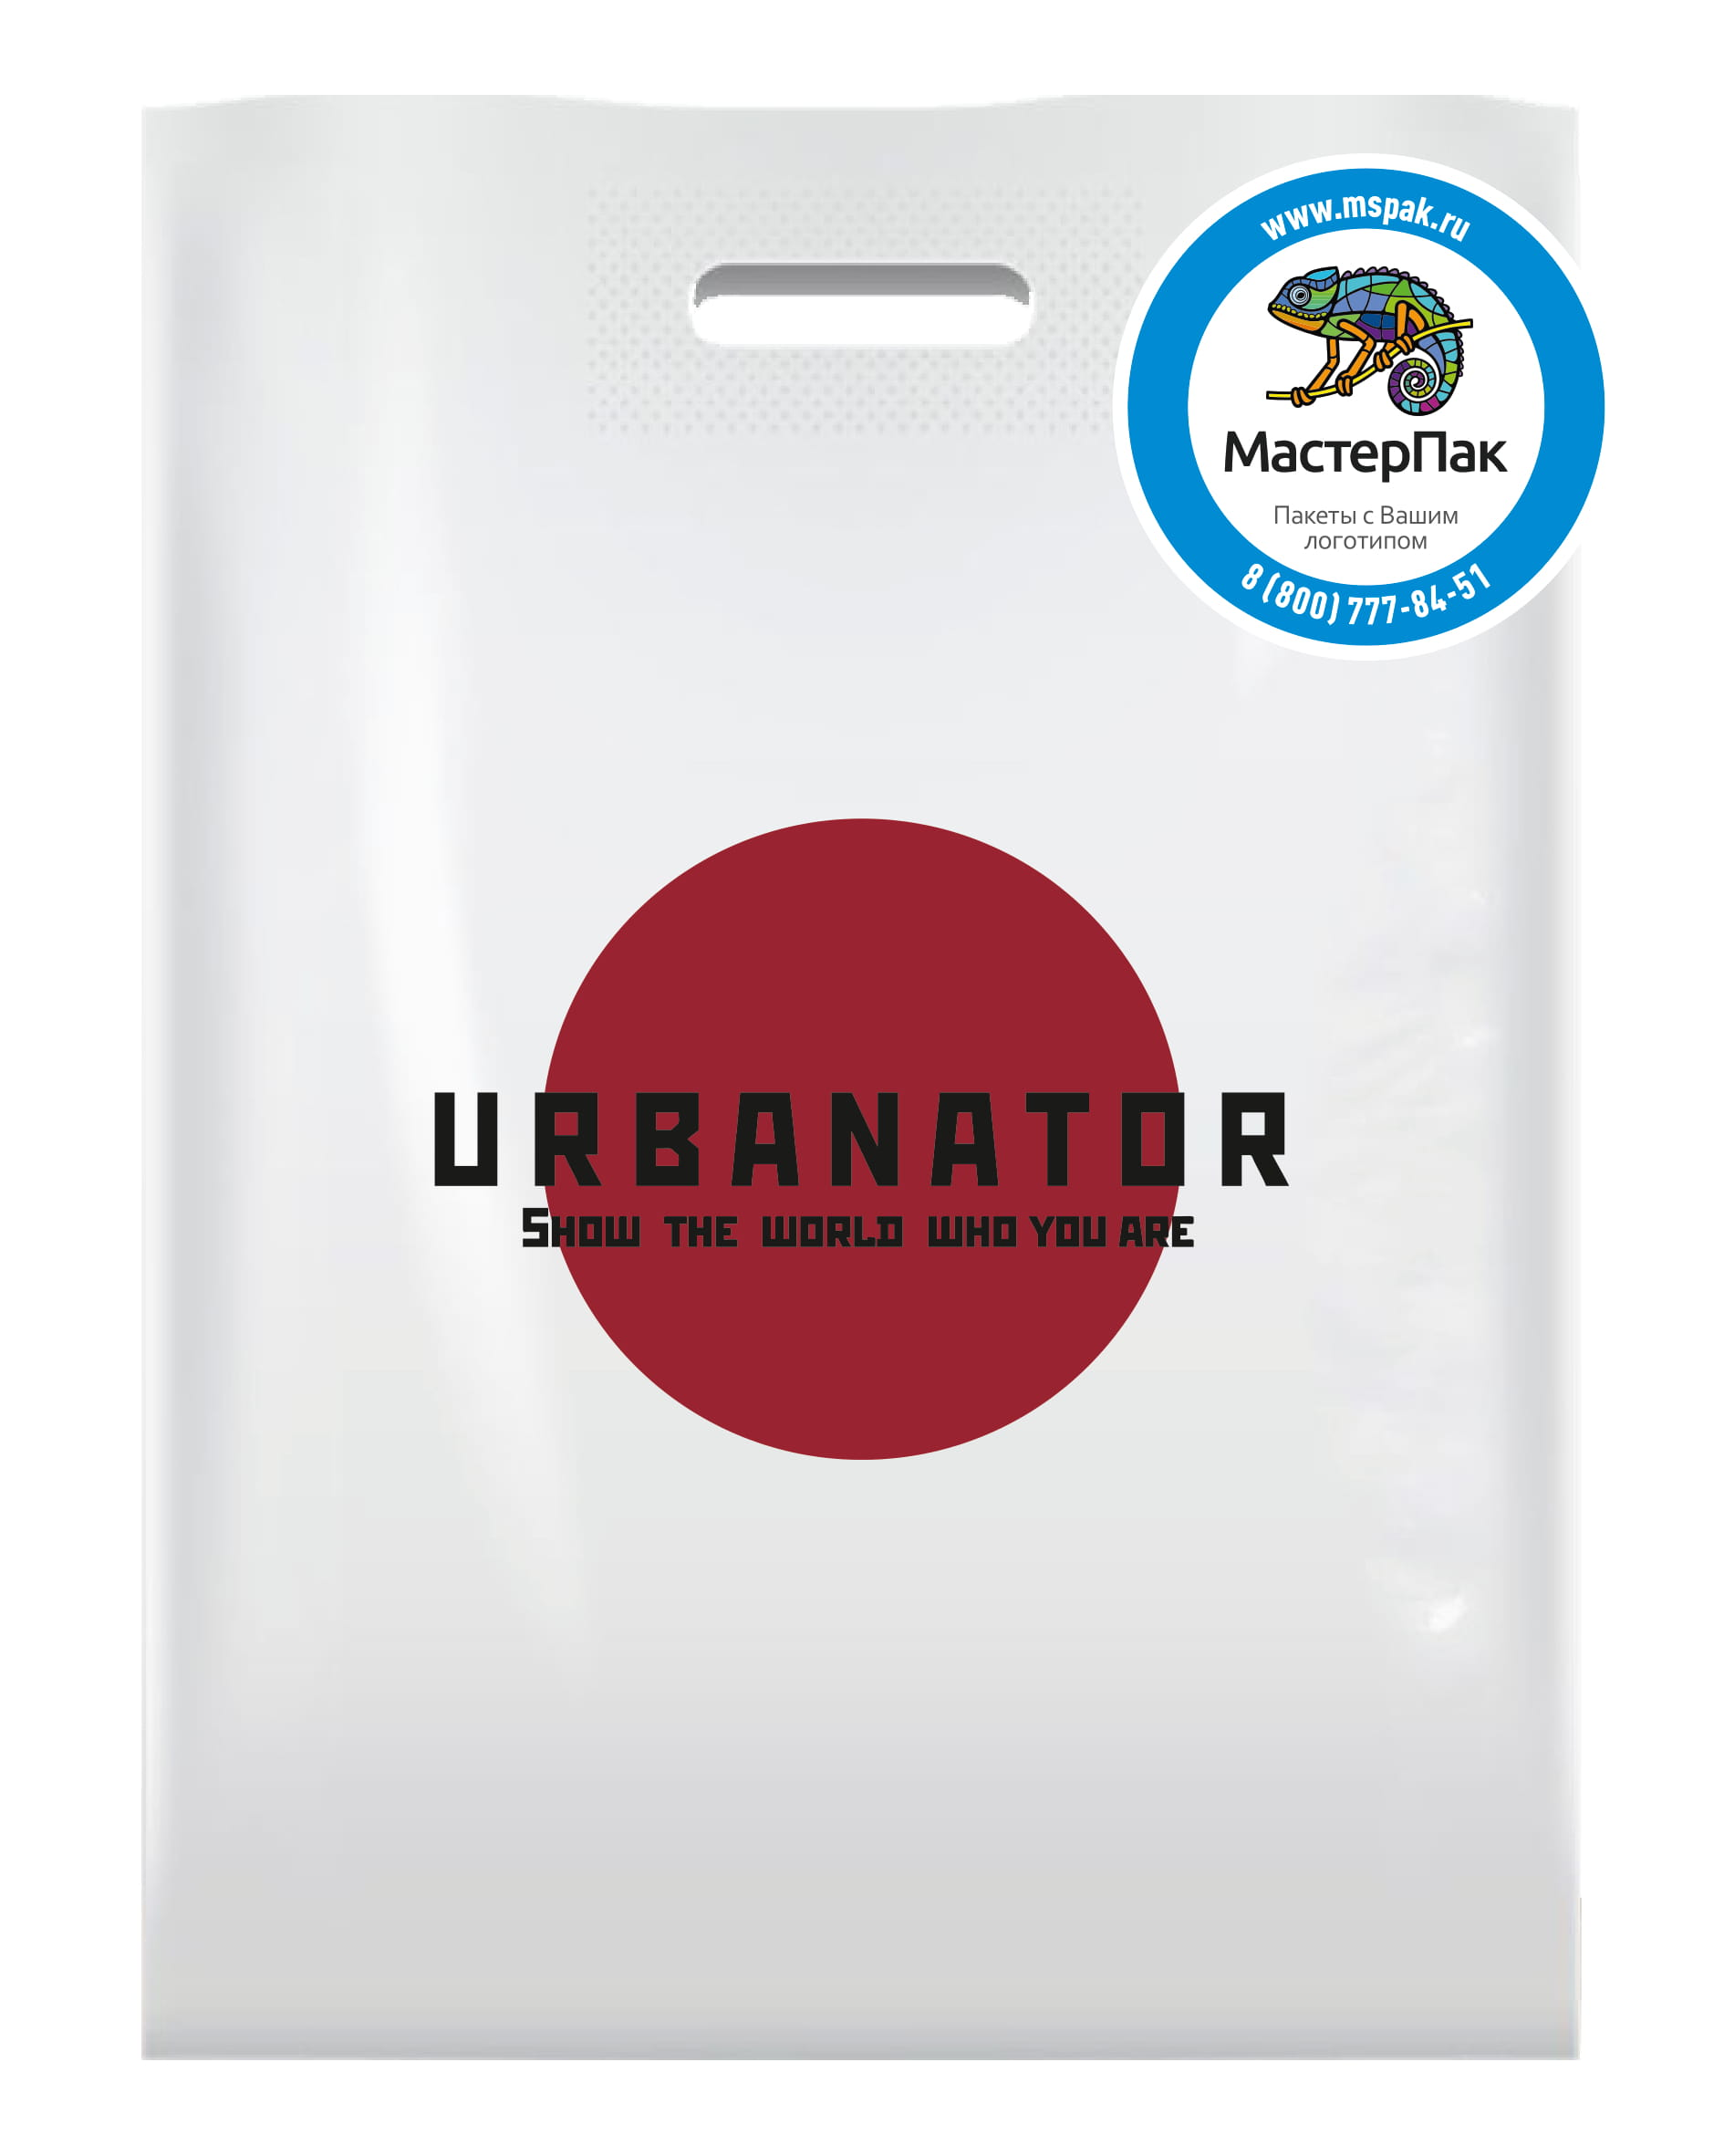 Пакет ПВД с логотипом Urbanator, Петербург, 70 мкм, 38*50, белый